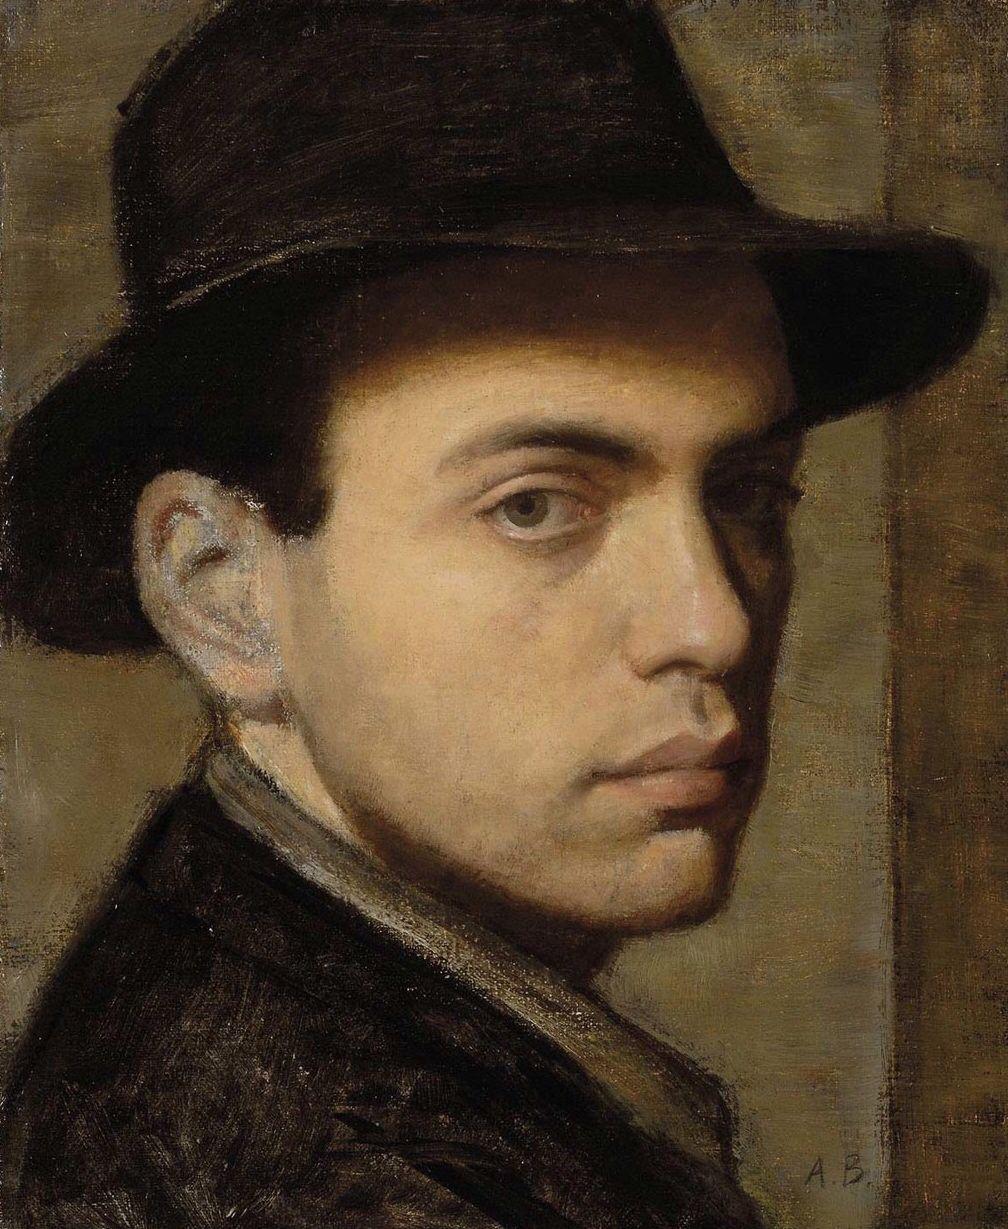 Antonio Bueno (1940) Self portrait, Portrait, Portrait